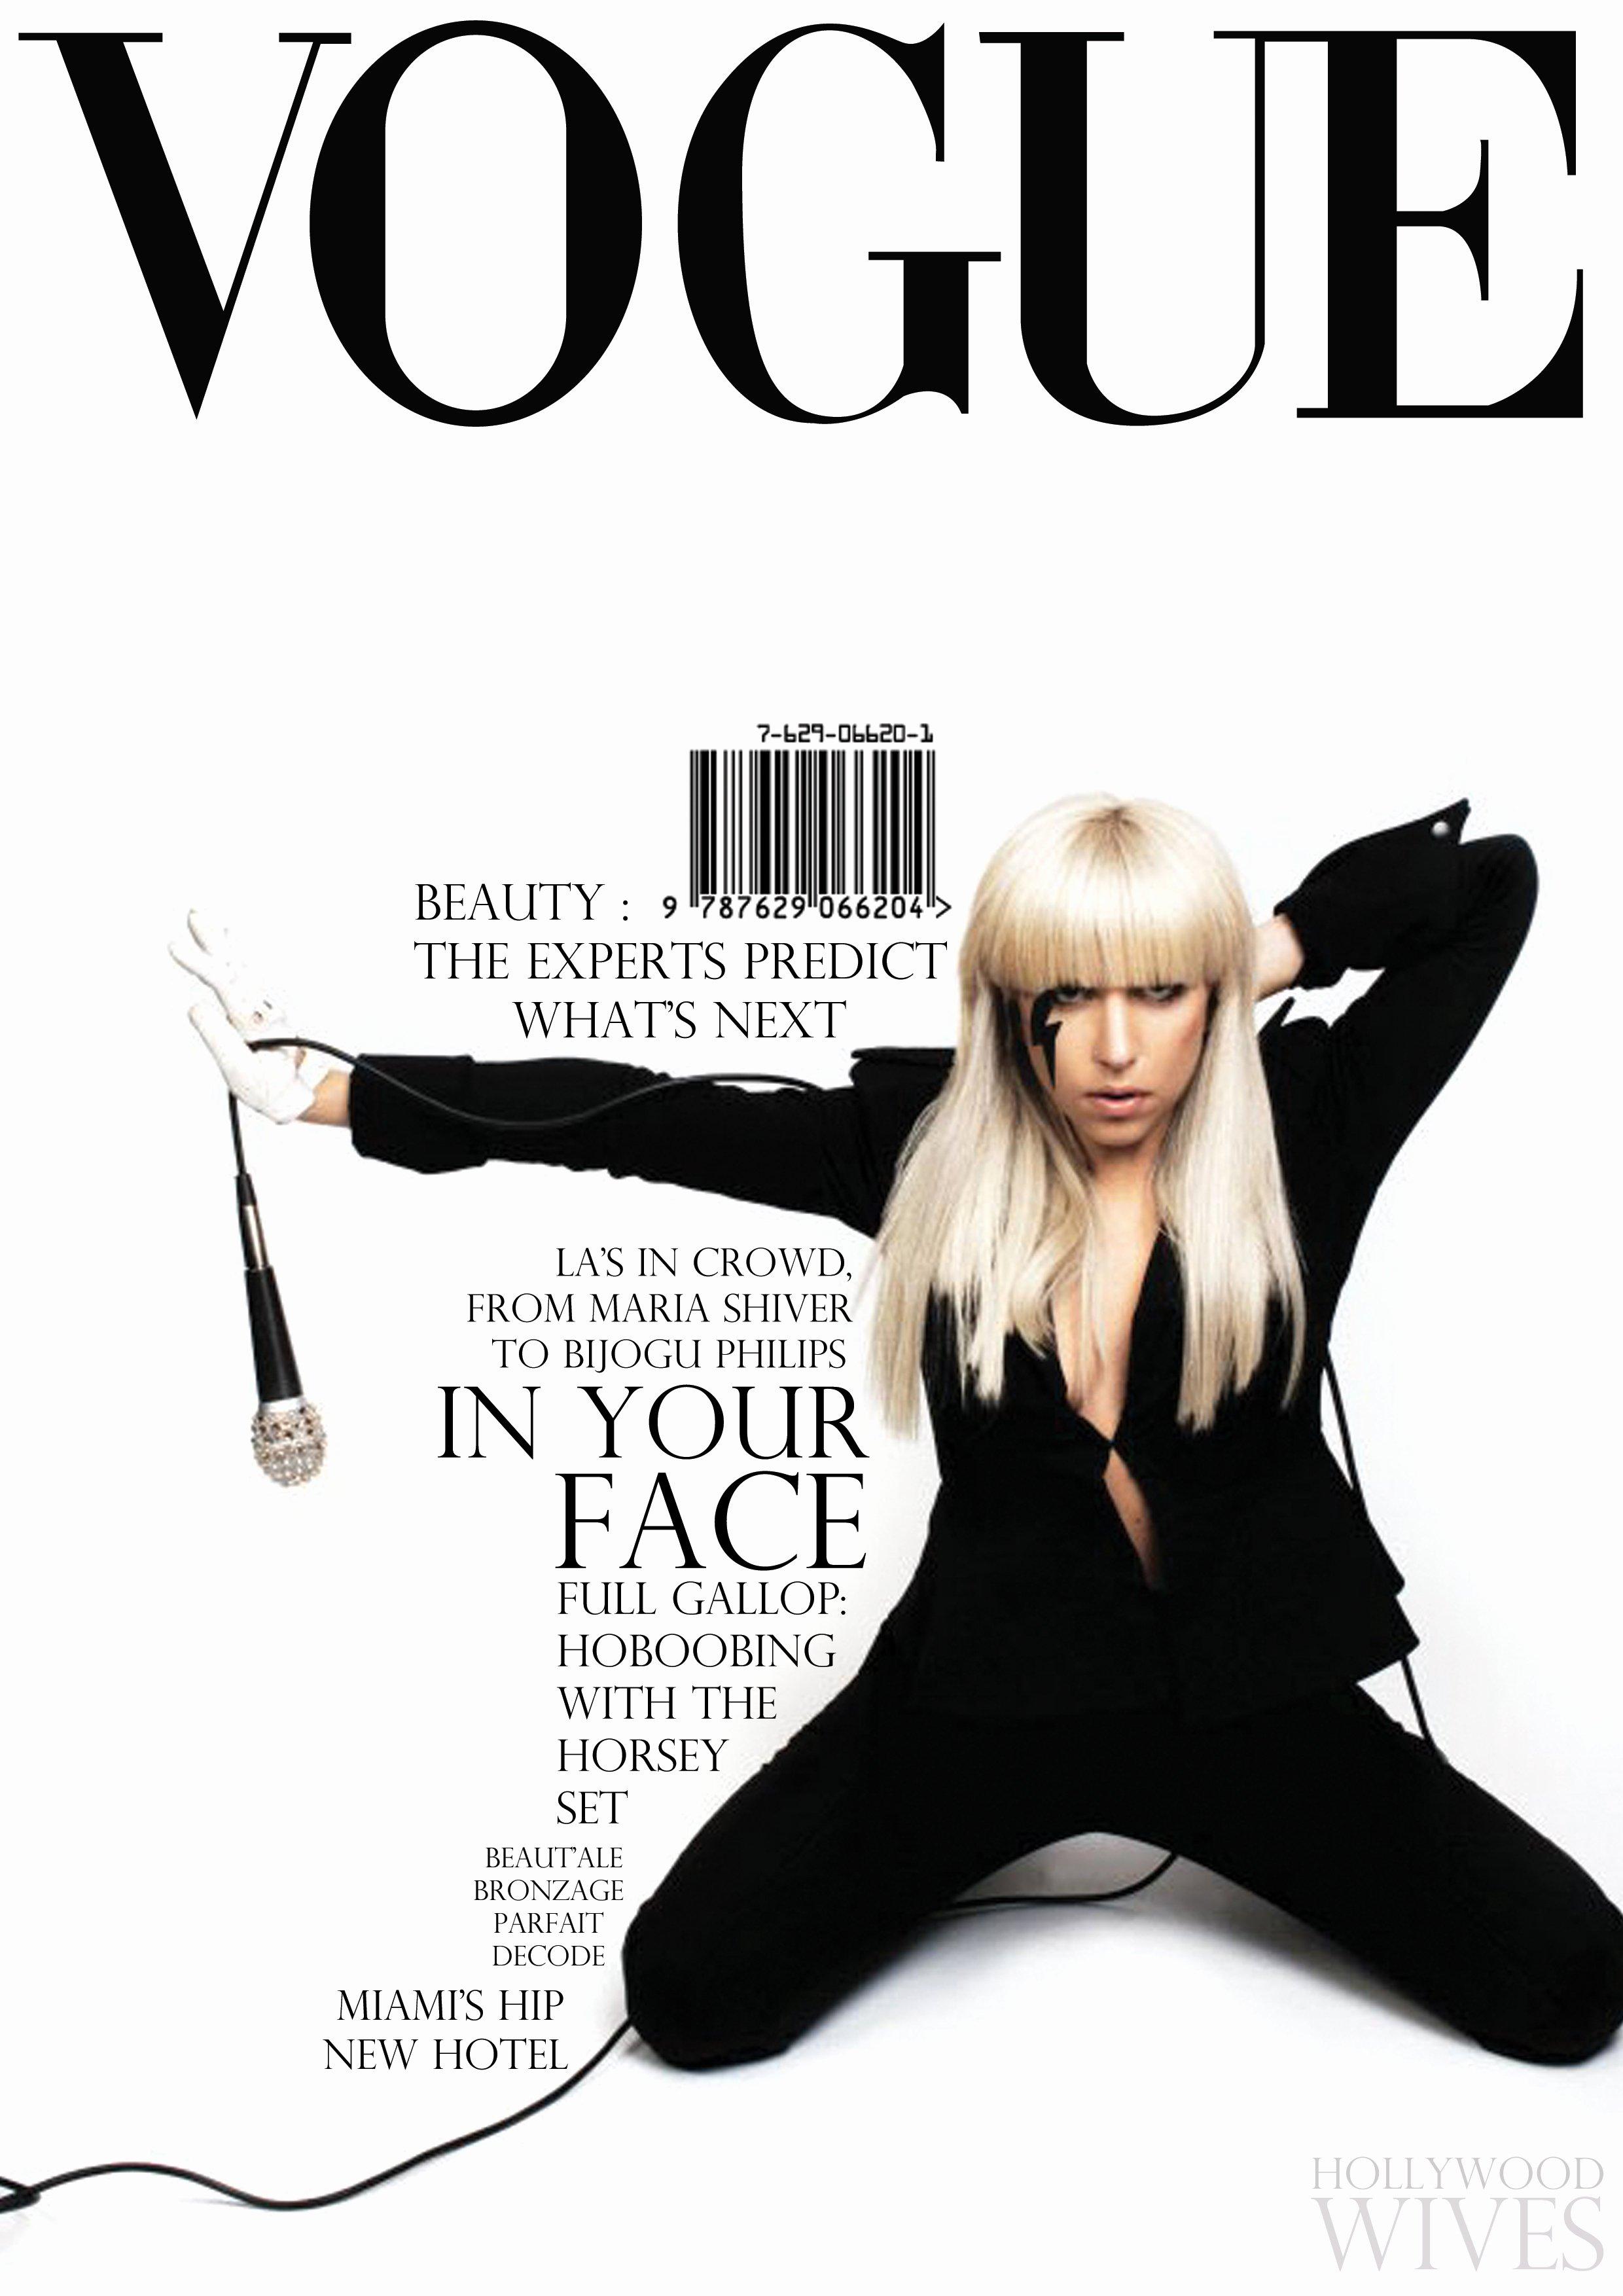 Vogue Magazine Cover Template Awesome Vogue Magazine Cover Template 40 attractive and Famous